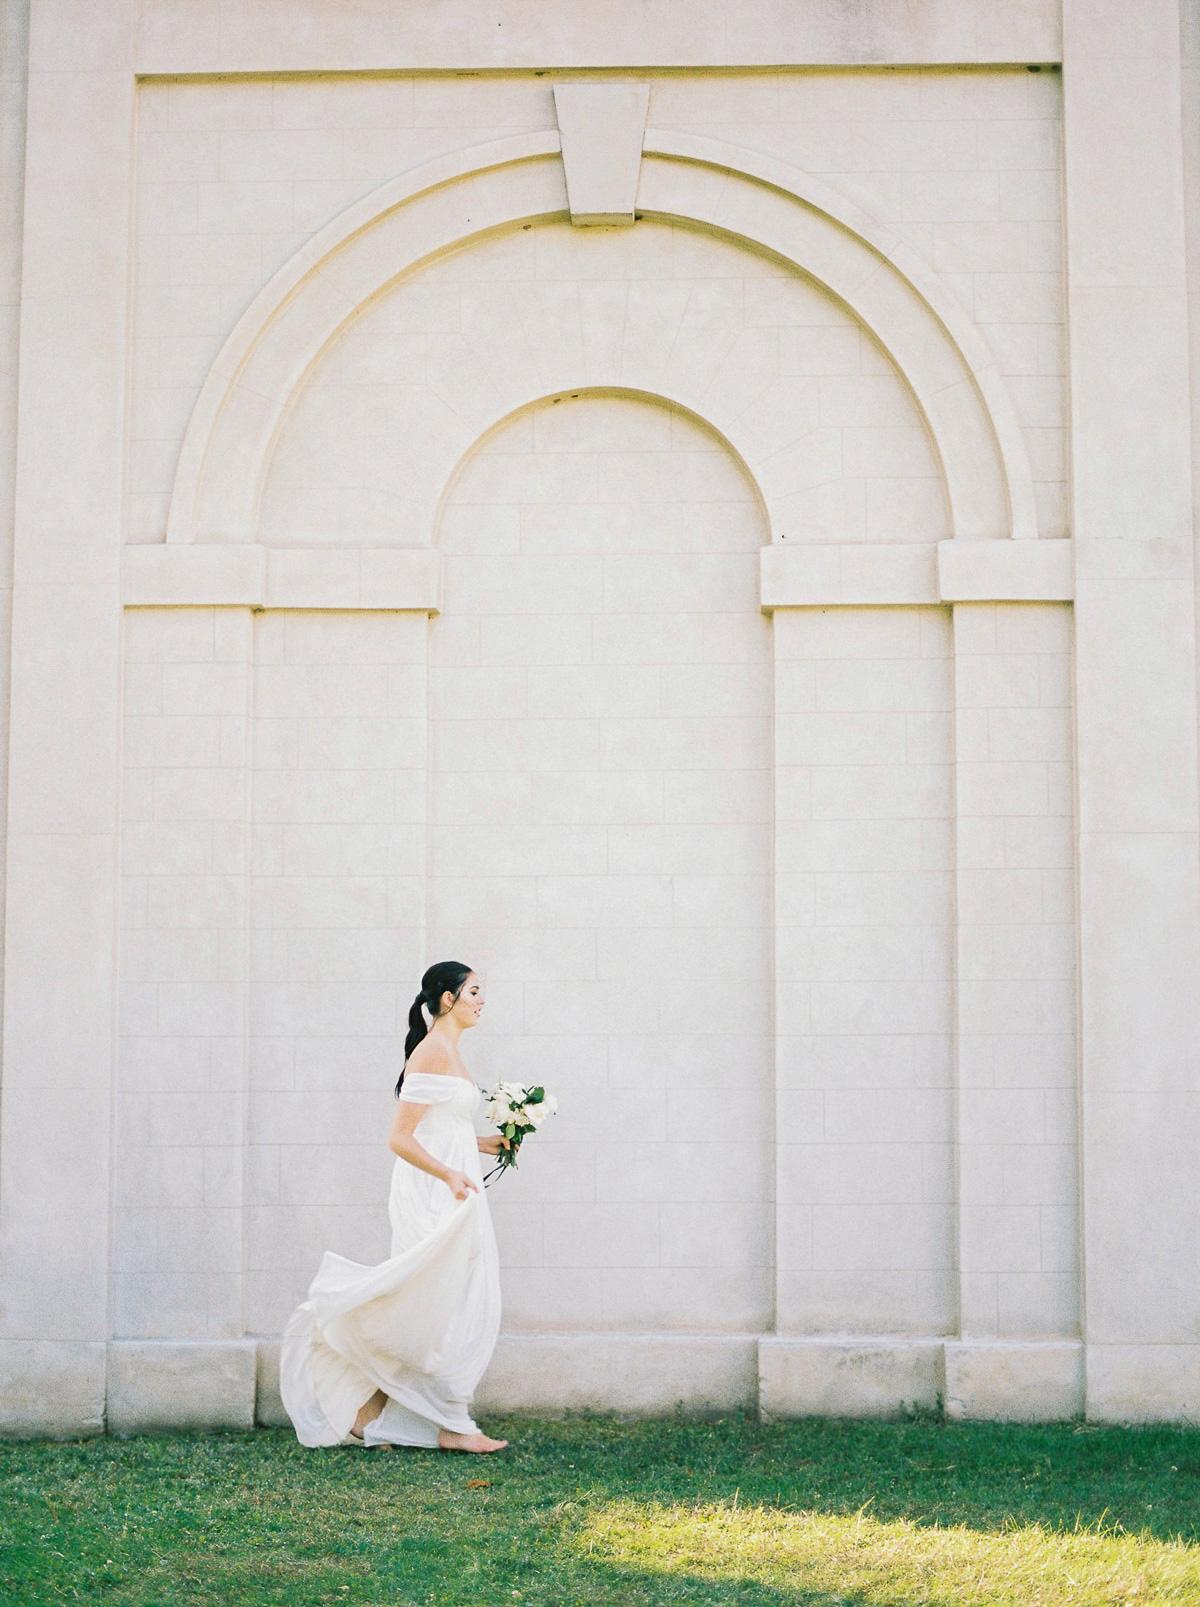 kurtz-orpia-photography-vineyard-bride-swish-list-dundurn-castle-dundas-wedding-editorial-22.jpg